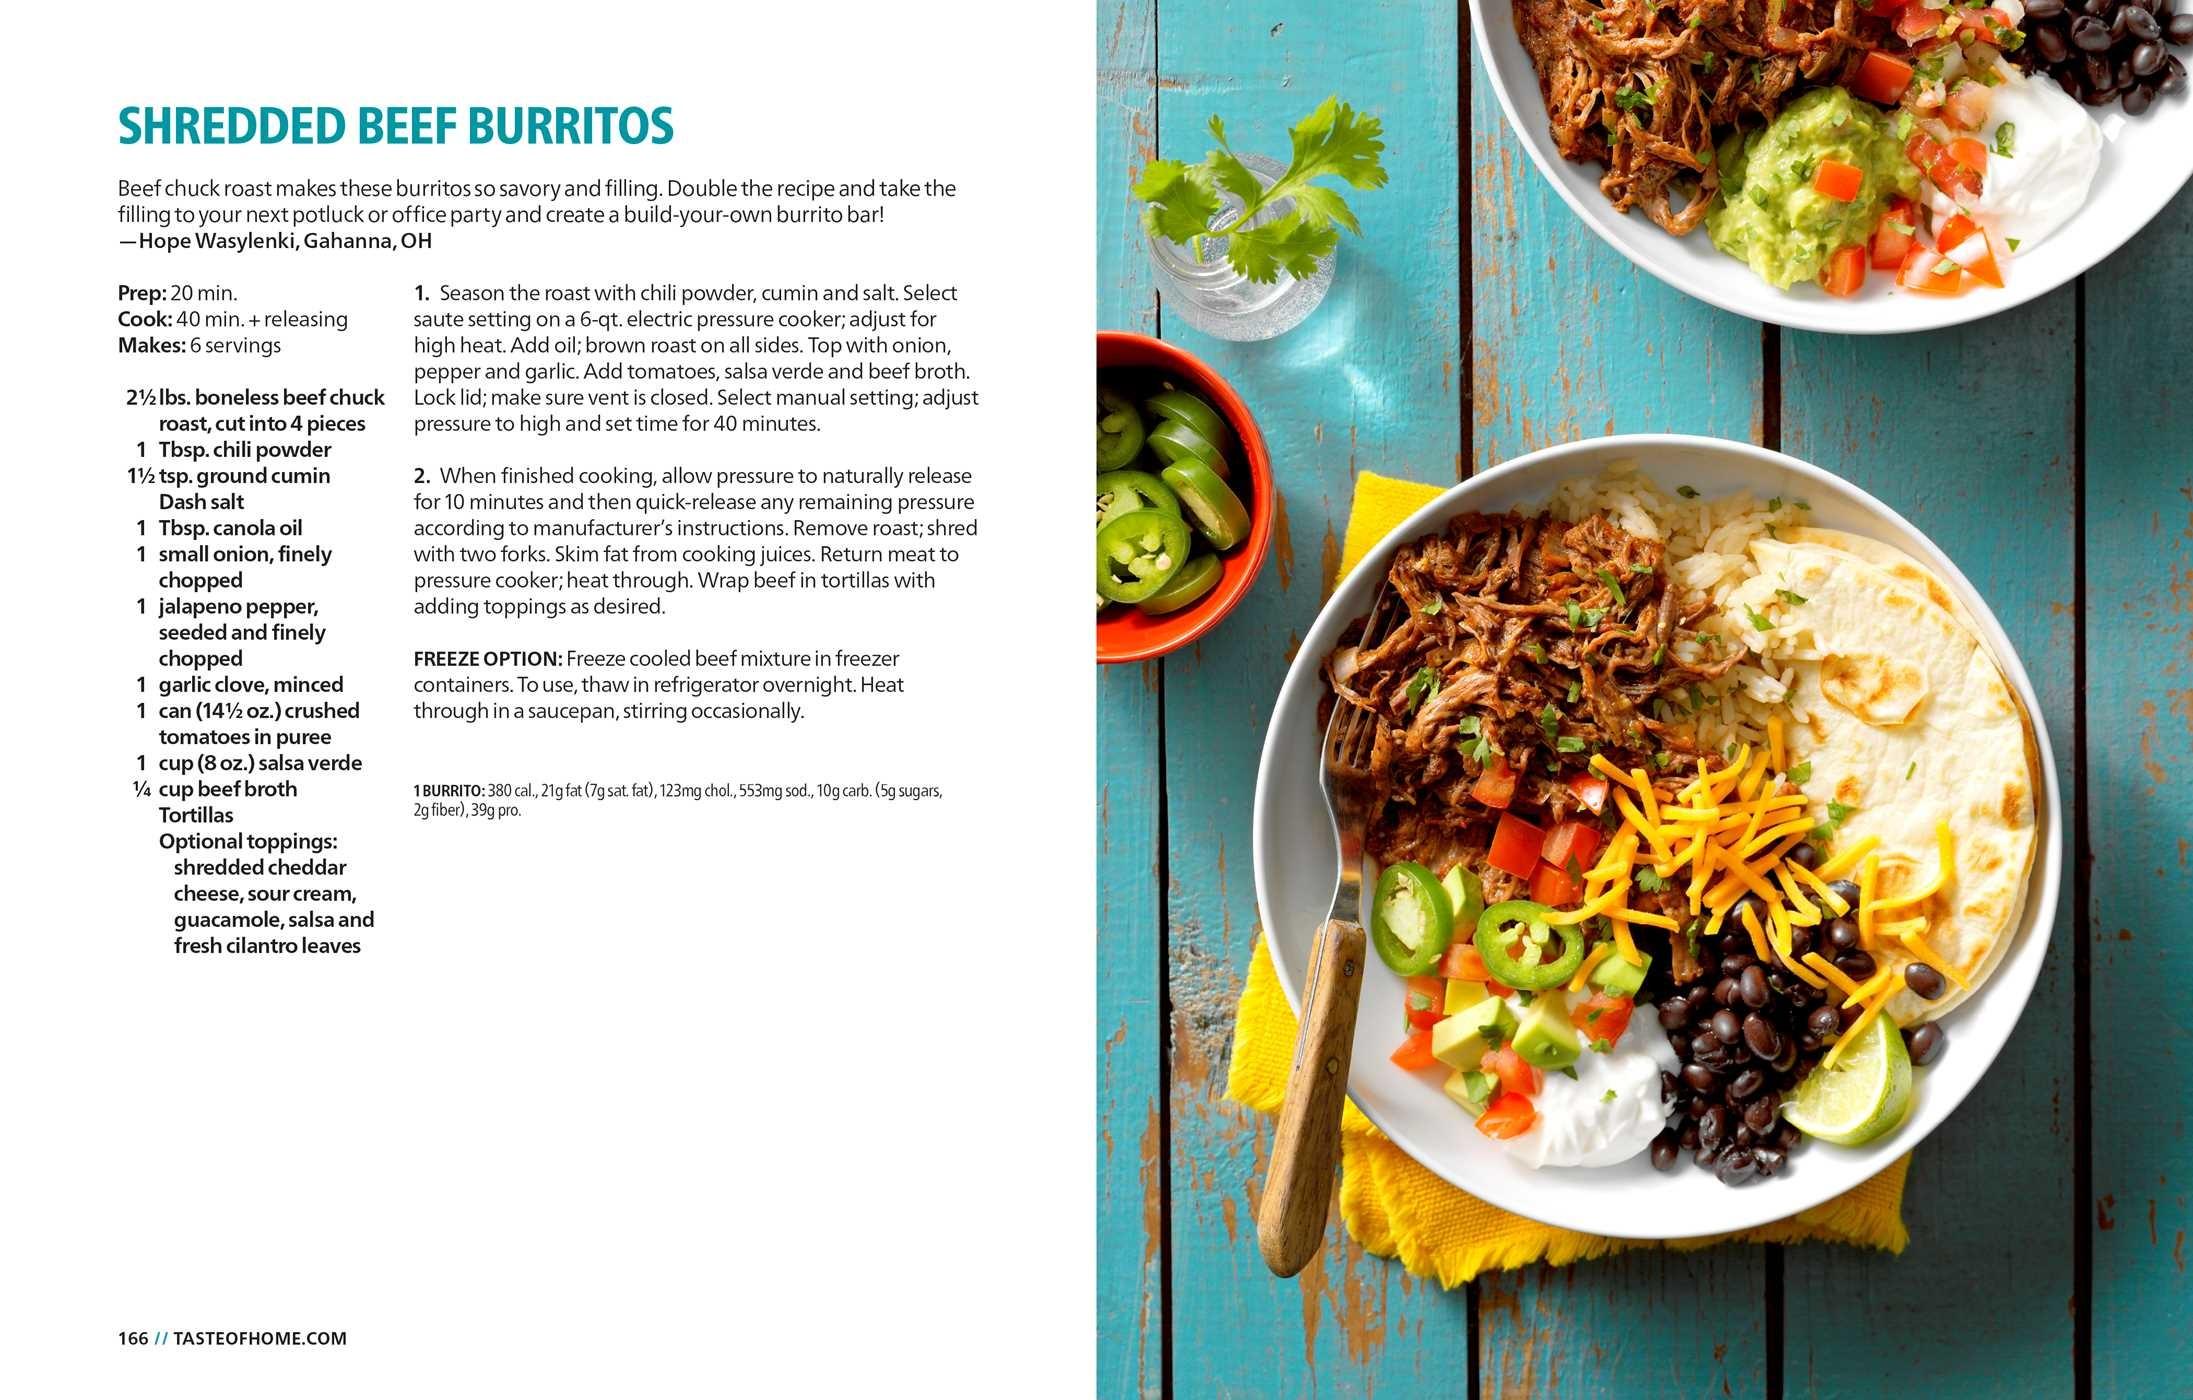 Taste of home instant pot cookbook 9781617657665.in12